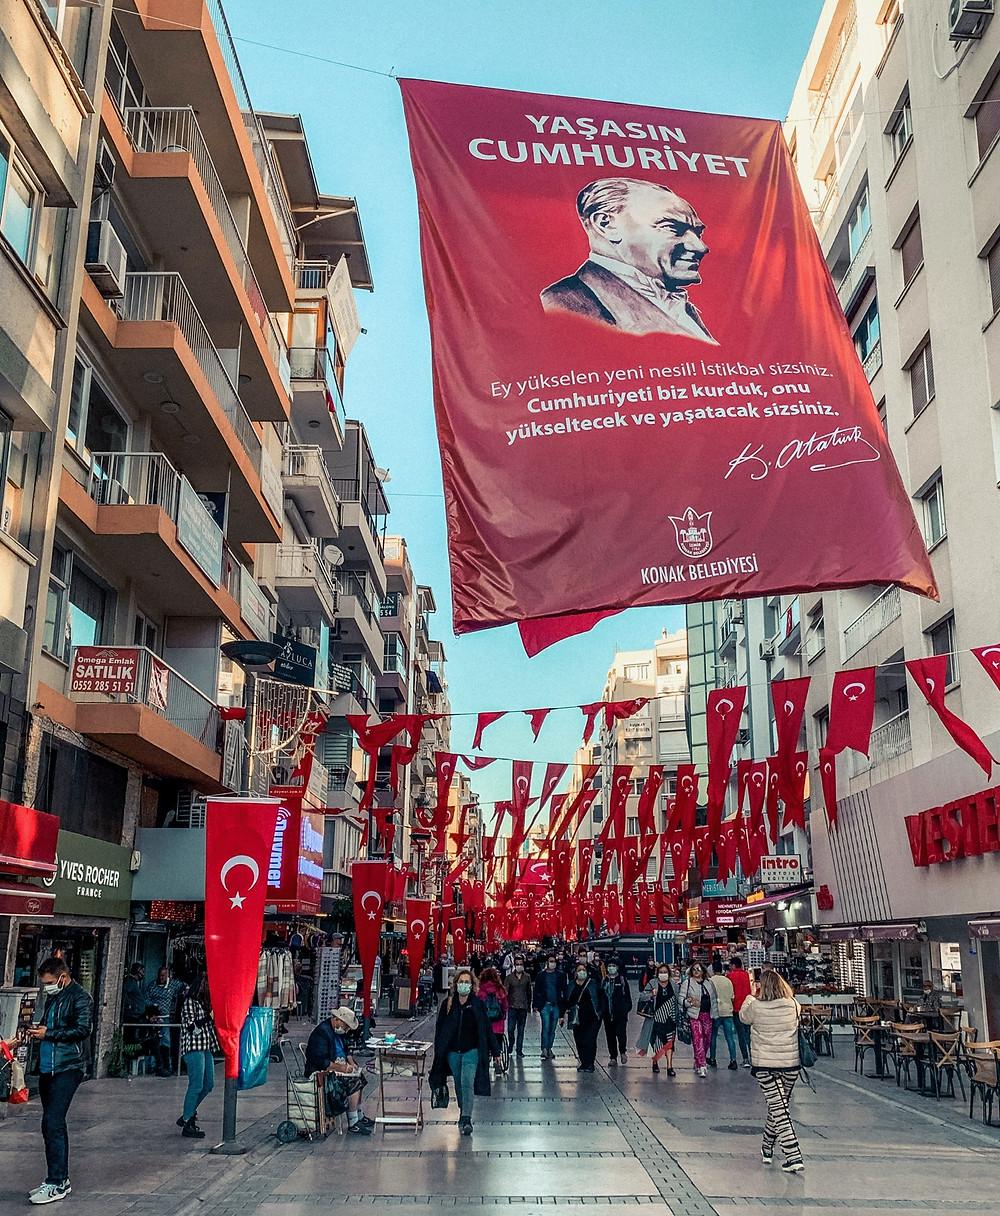 Izmir, embracing its Ataturk pride